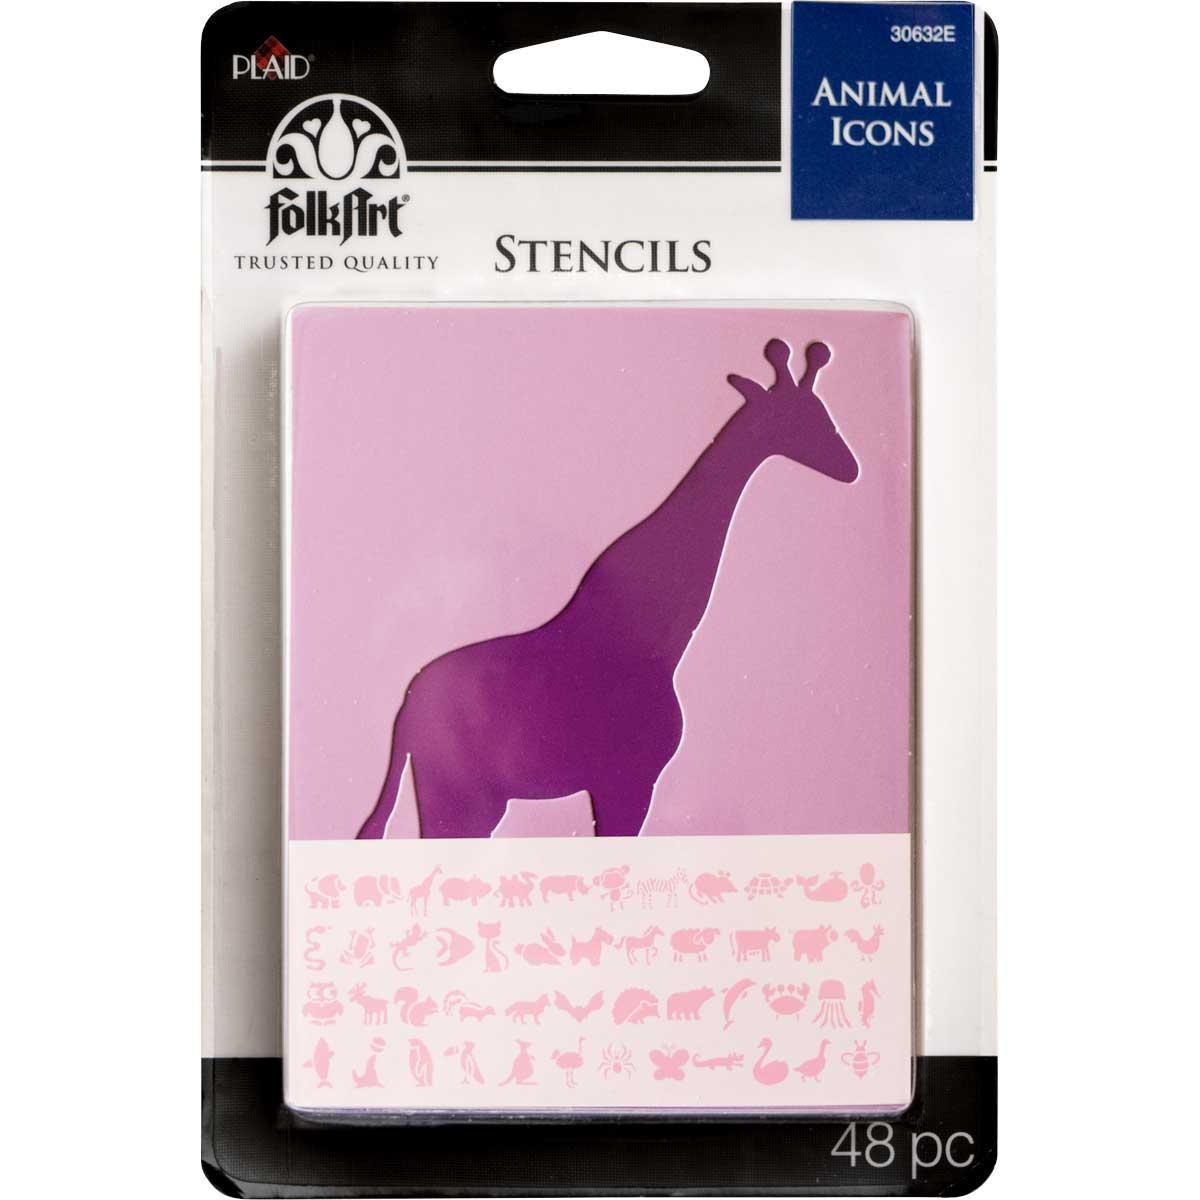 Plaid ® Stencils - Value Packs - 3